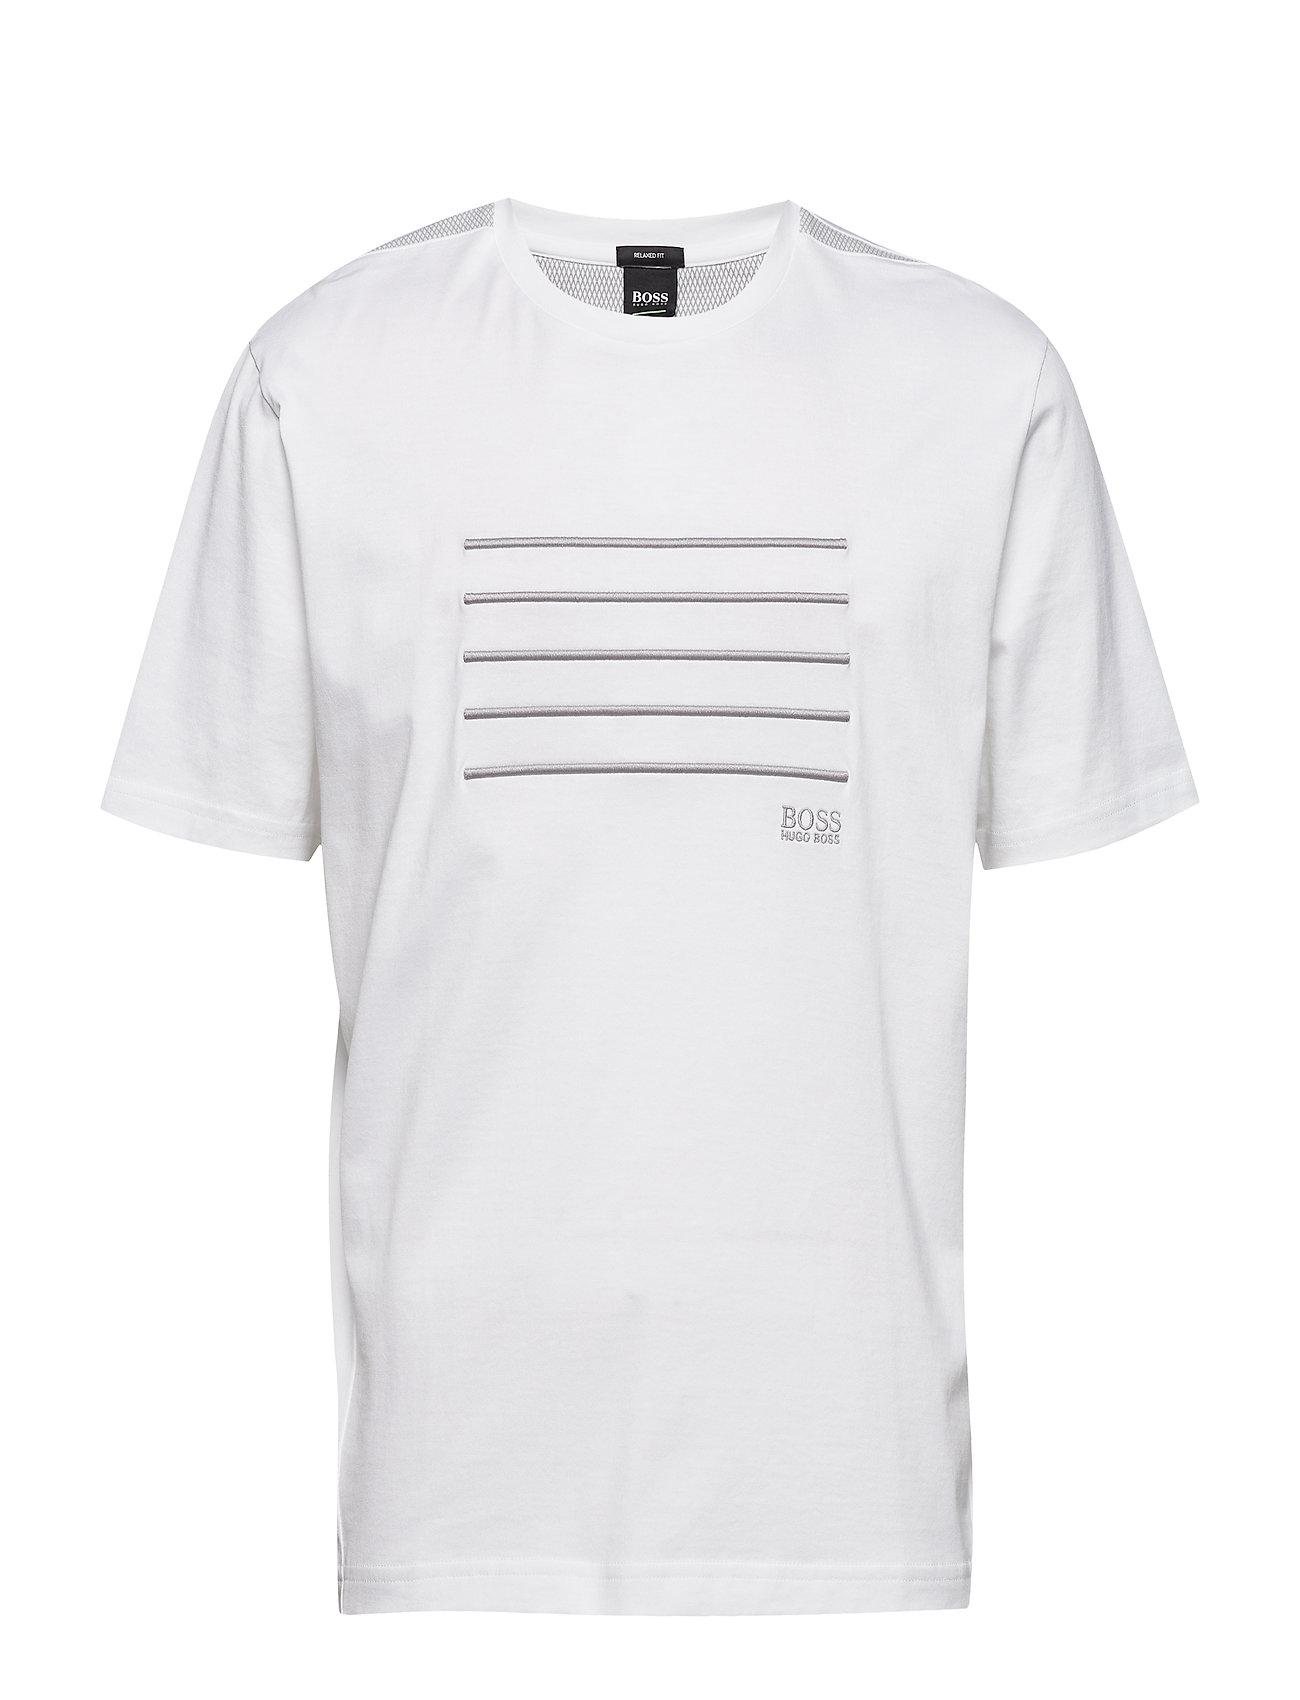 Boss Athleisure Wear Tee 8 - WHITE